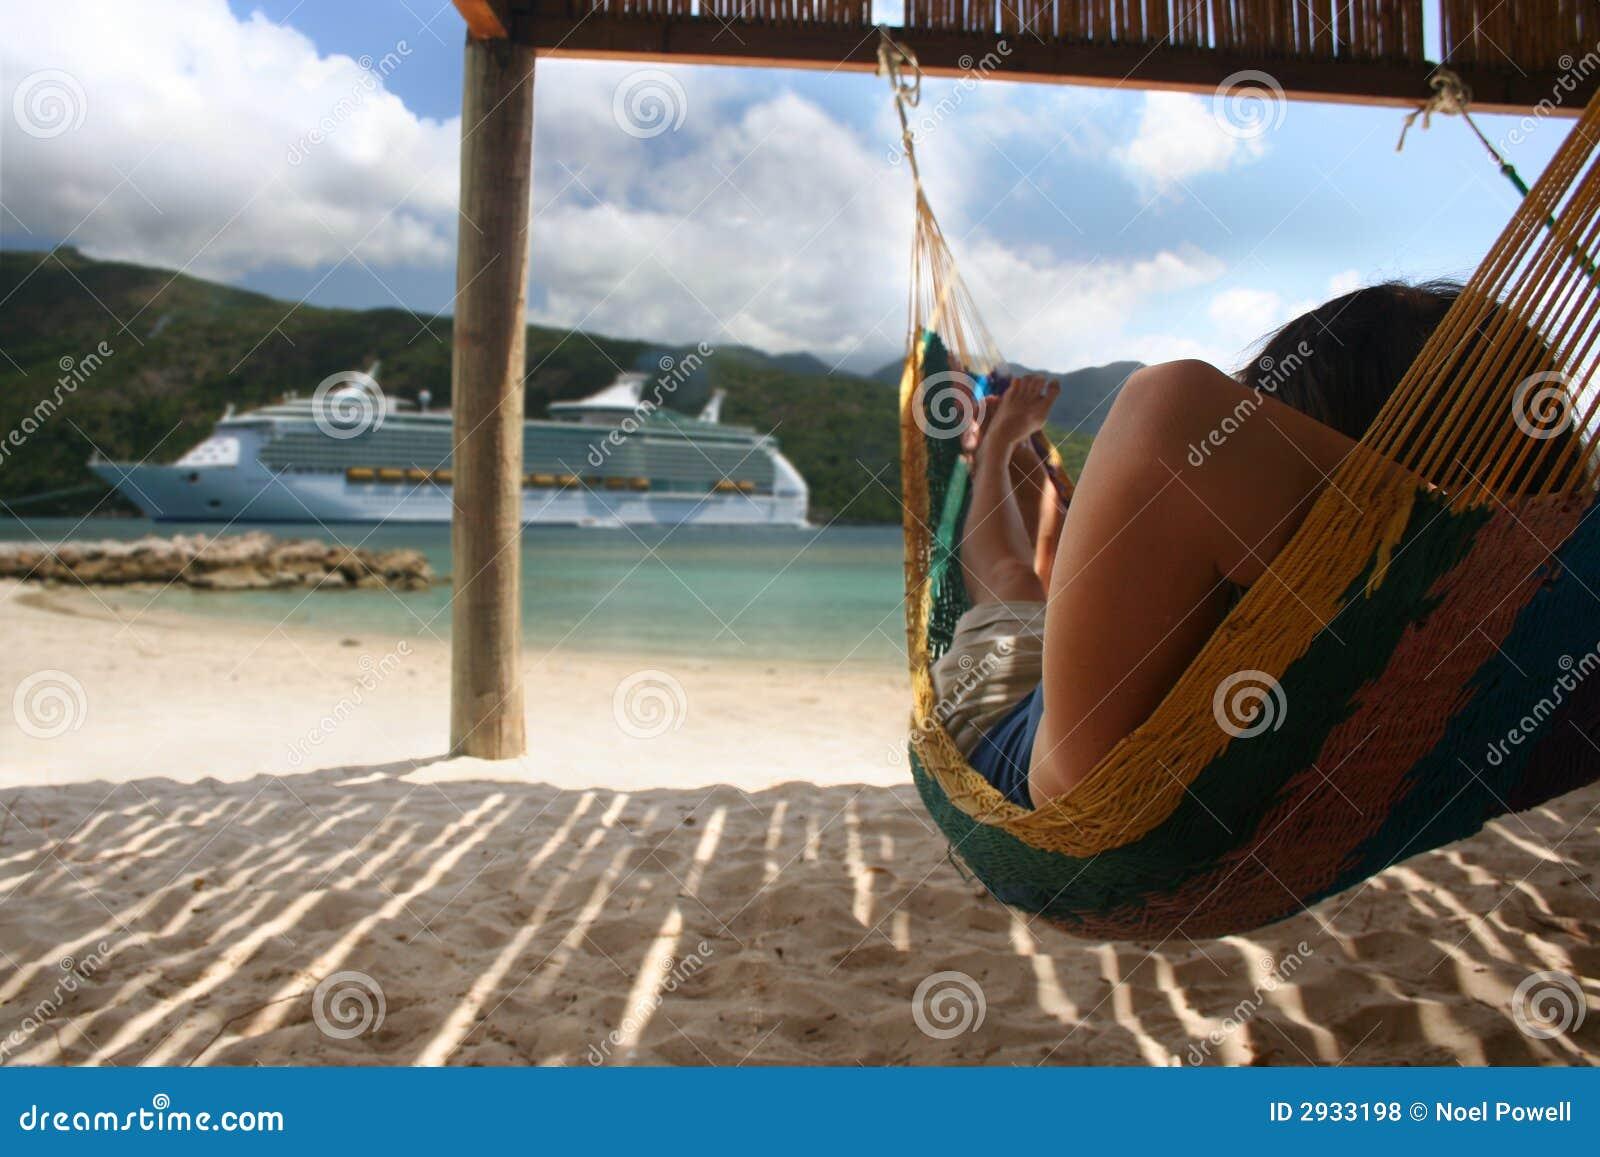 Hammock And Cruise Ship Royalty Free Stock Photos Image